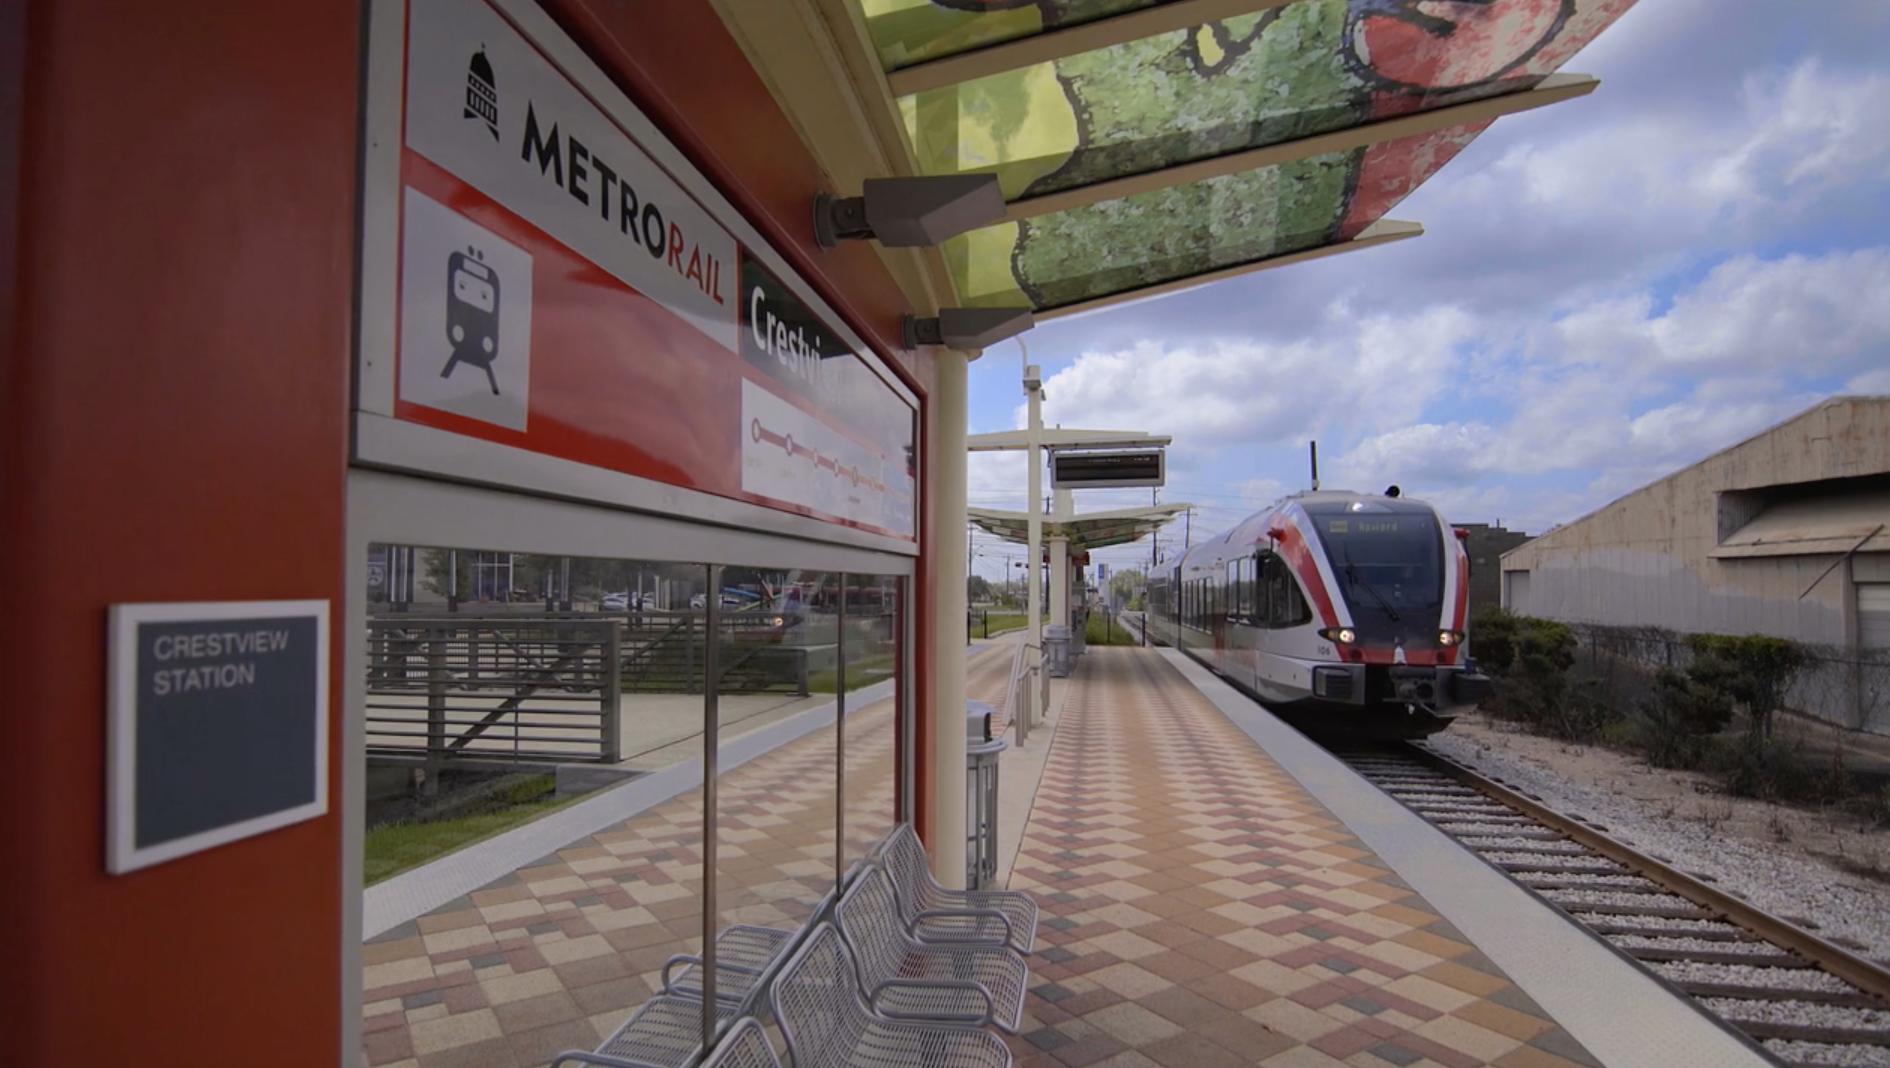 Close to MetroRail